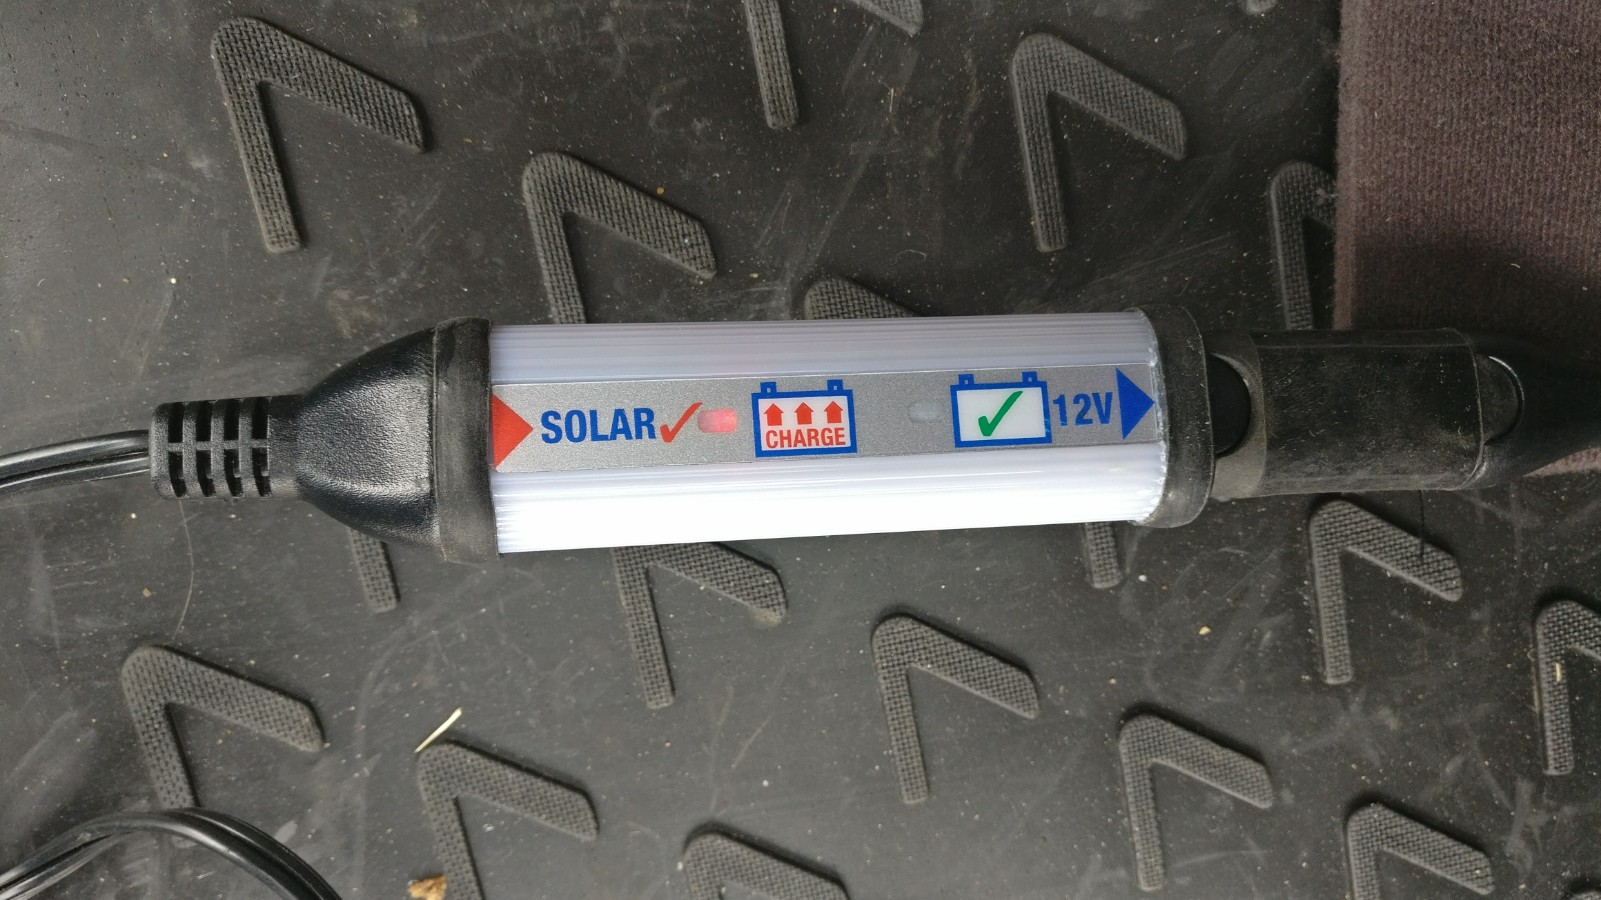 5 - Optimate Solar: описание и фотоотчёт об установке